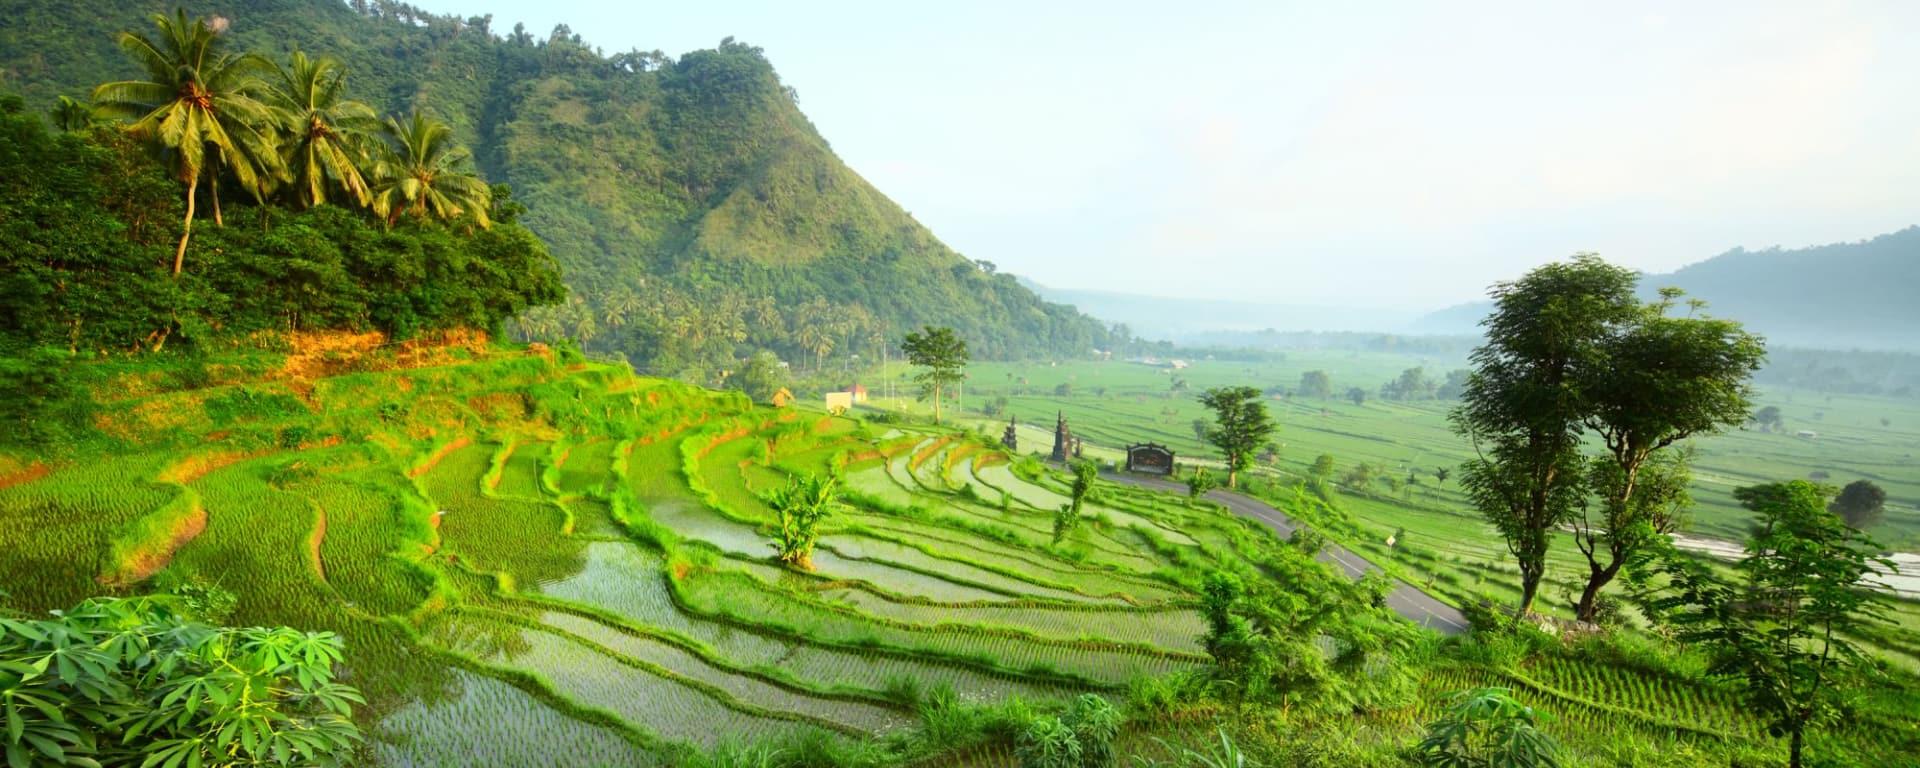 Erlebnisreiches Bali ab Südbali: Bali Rice fields